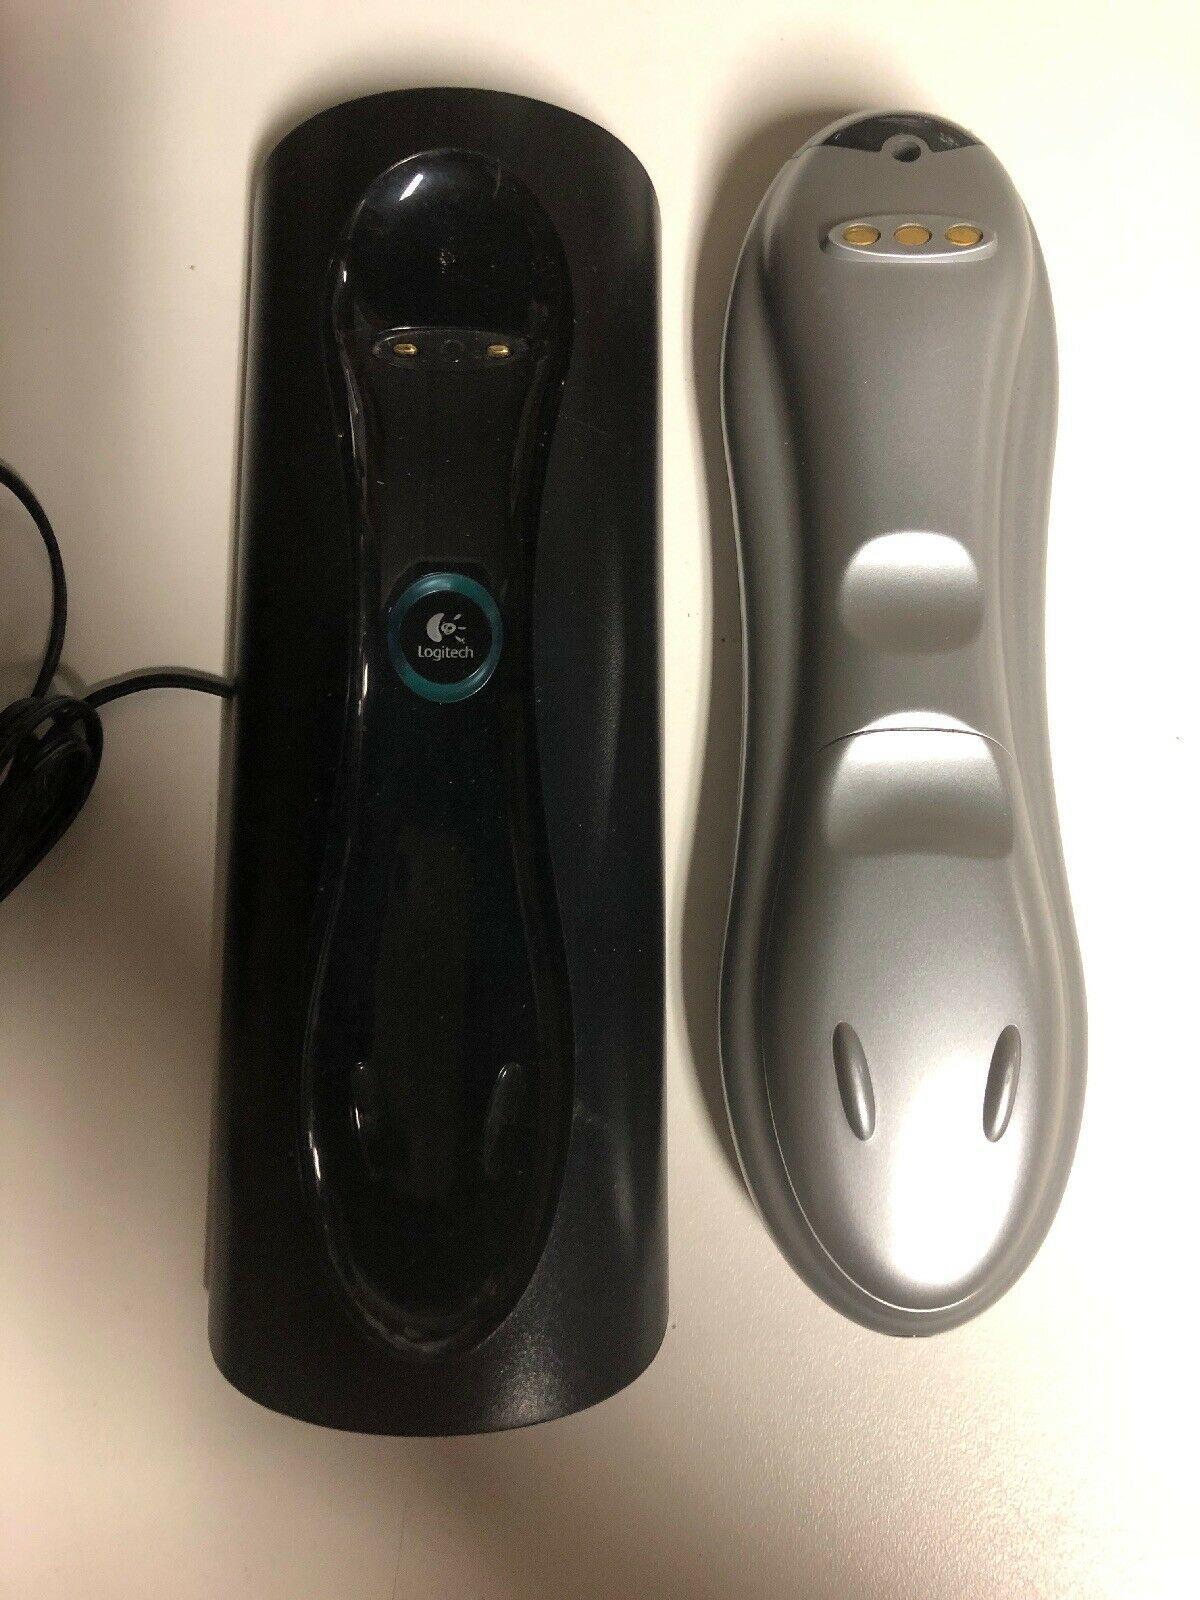 Logitech Harmony 890  LCD Universal Remote Control w/ Battery, Cradle & AC Adapt